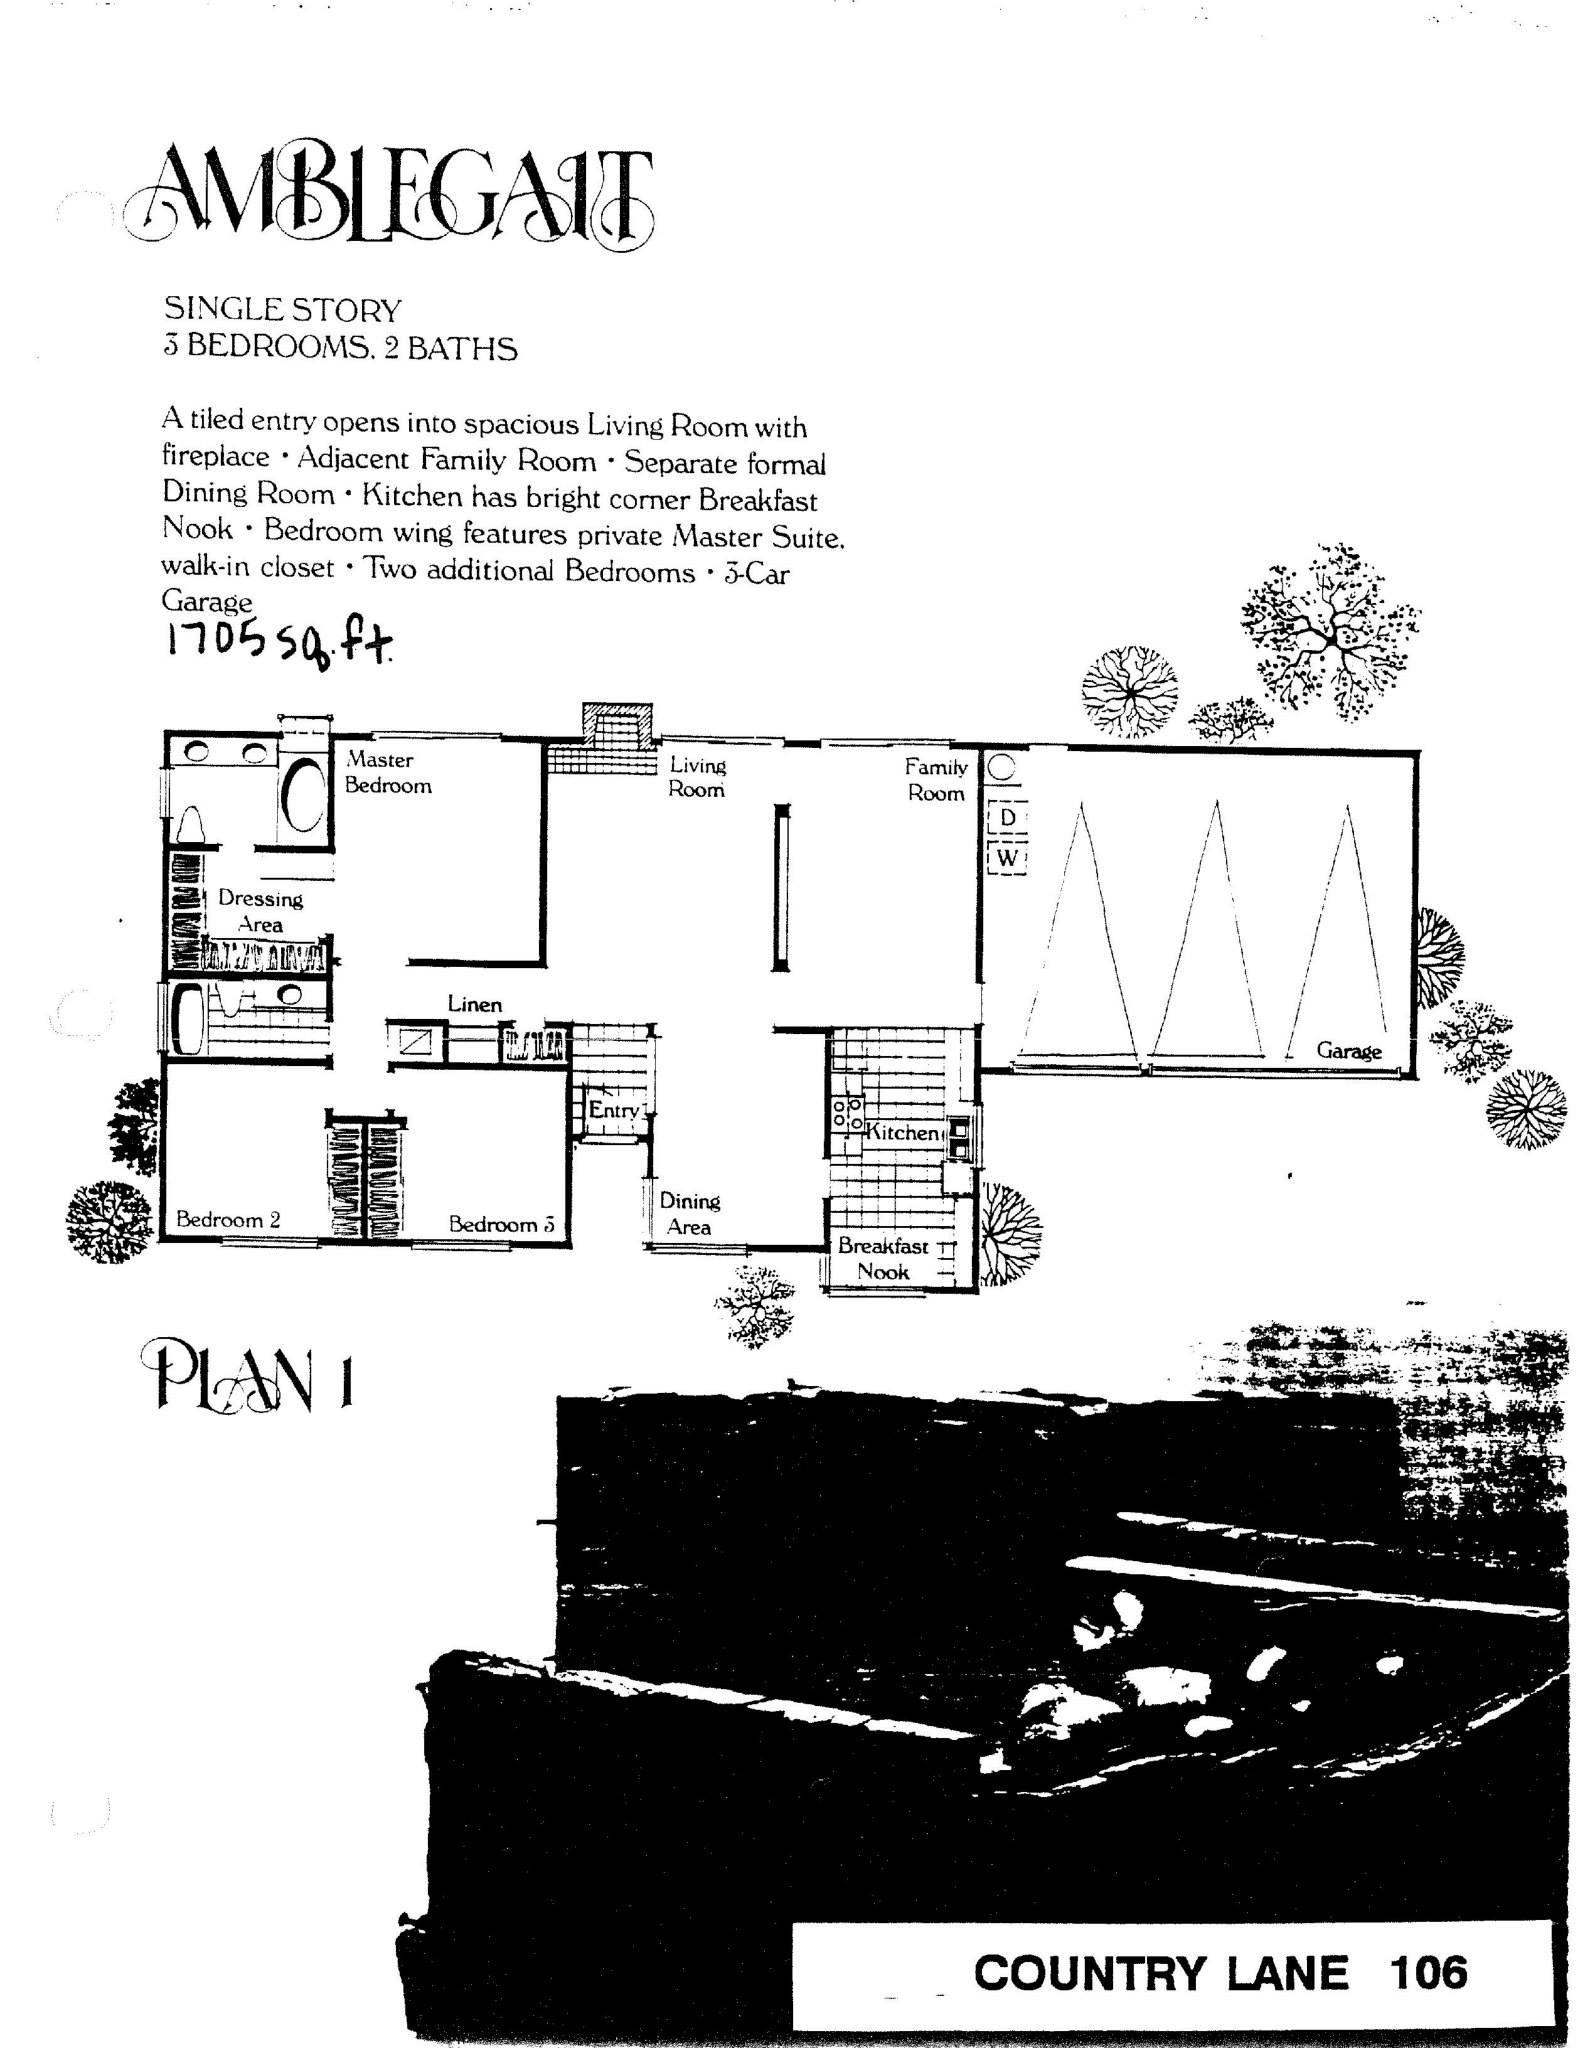 Country Lane - Amblegait - Plan 1